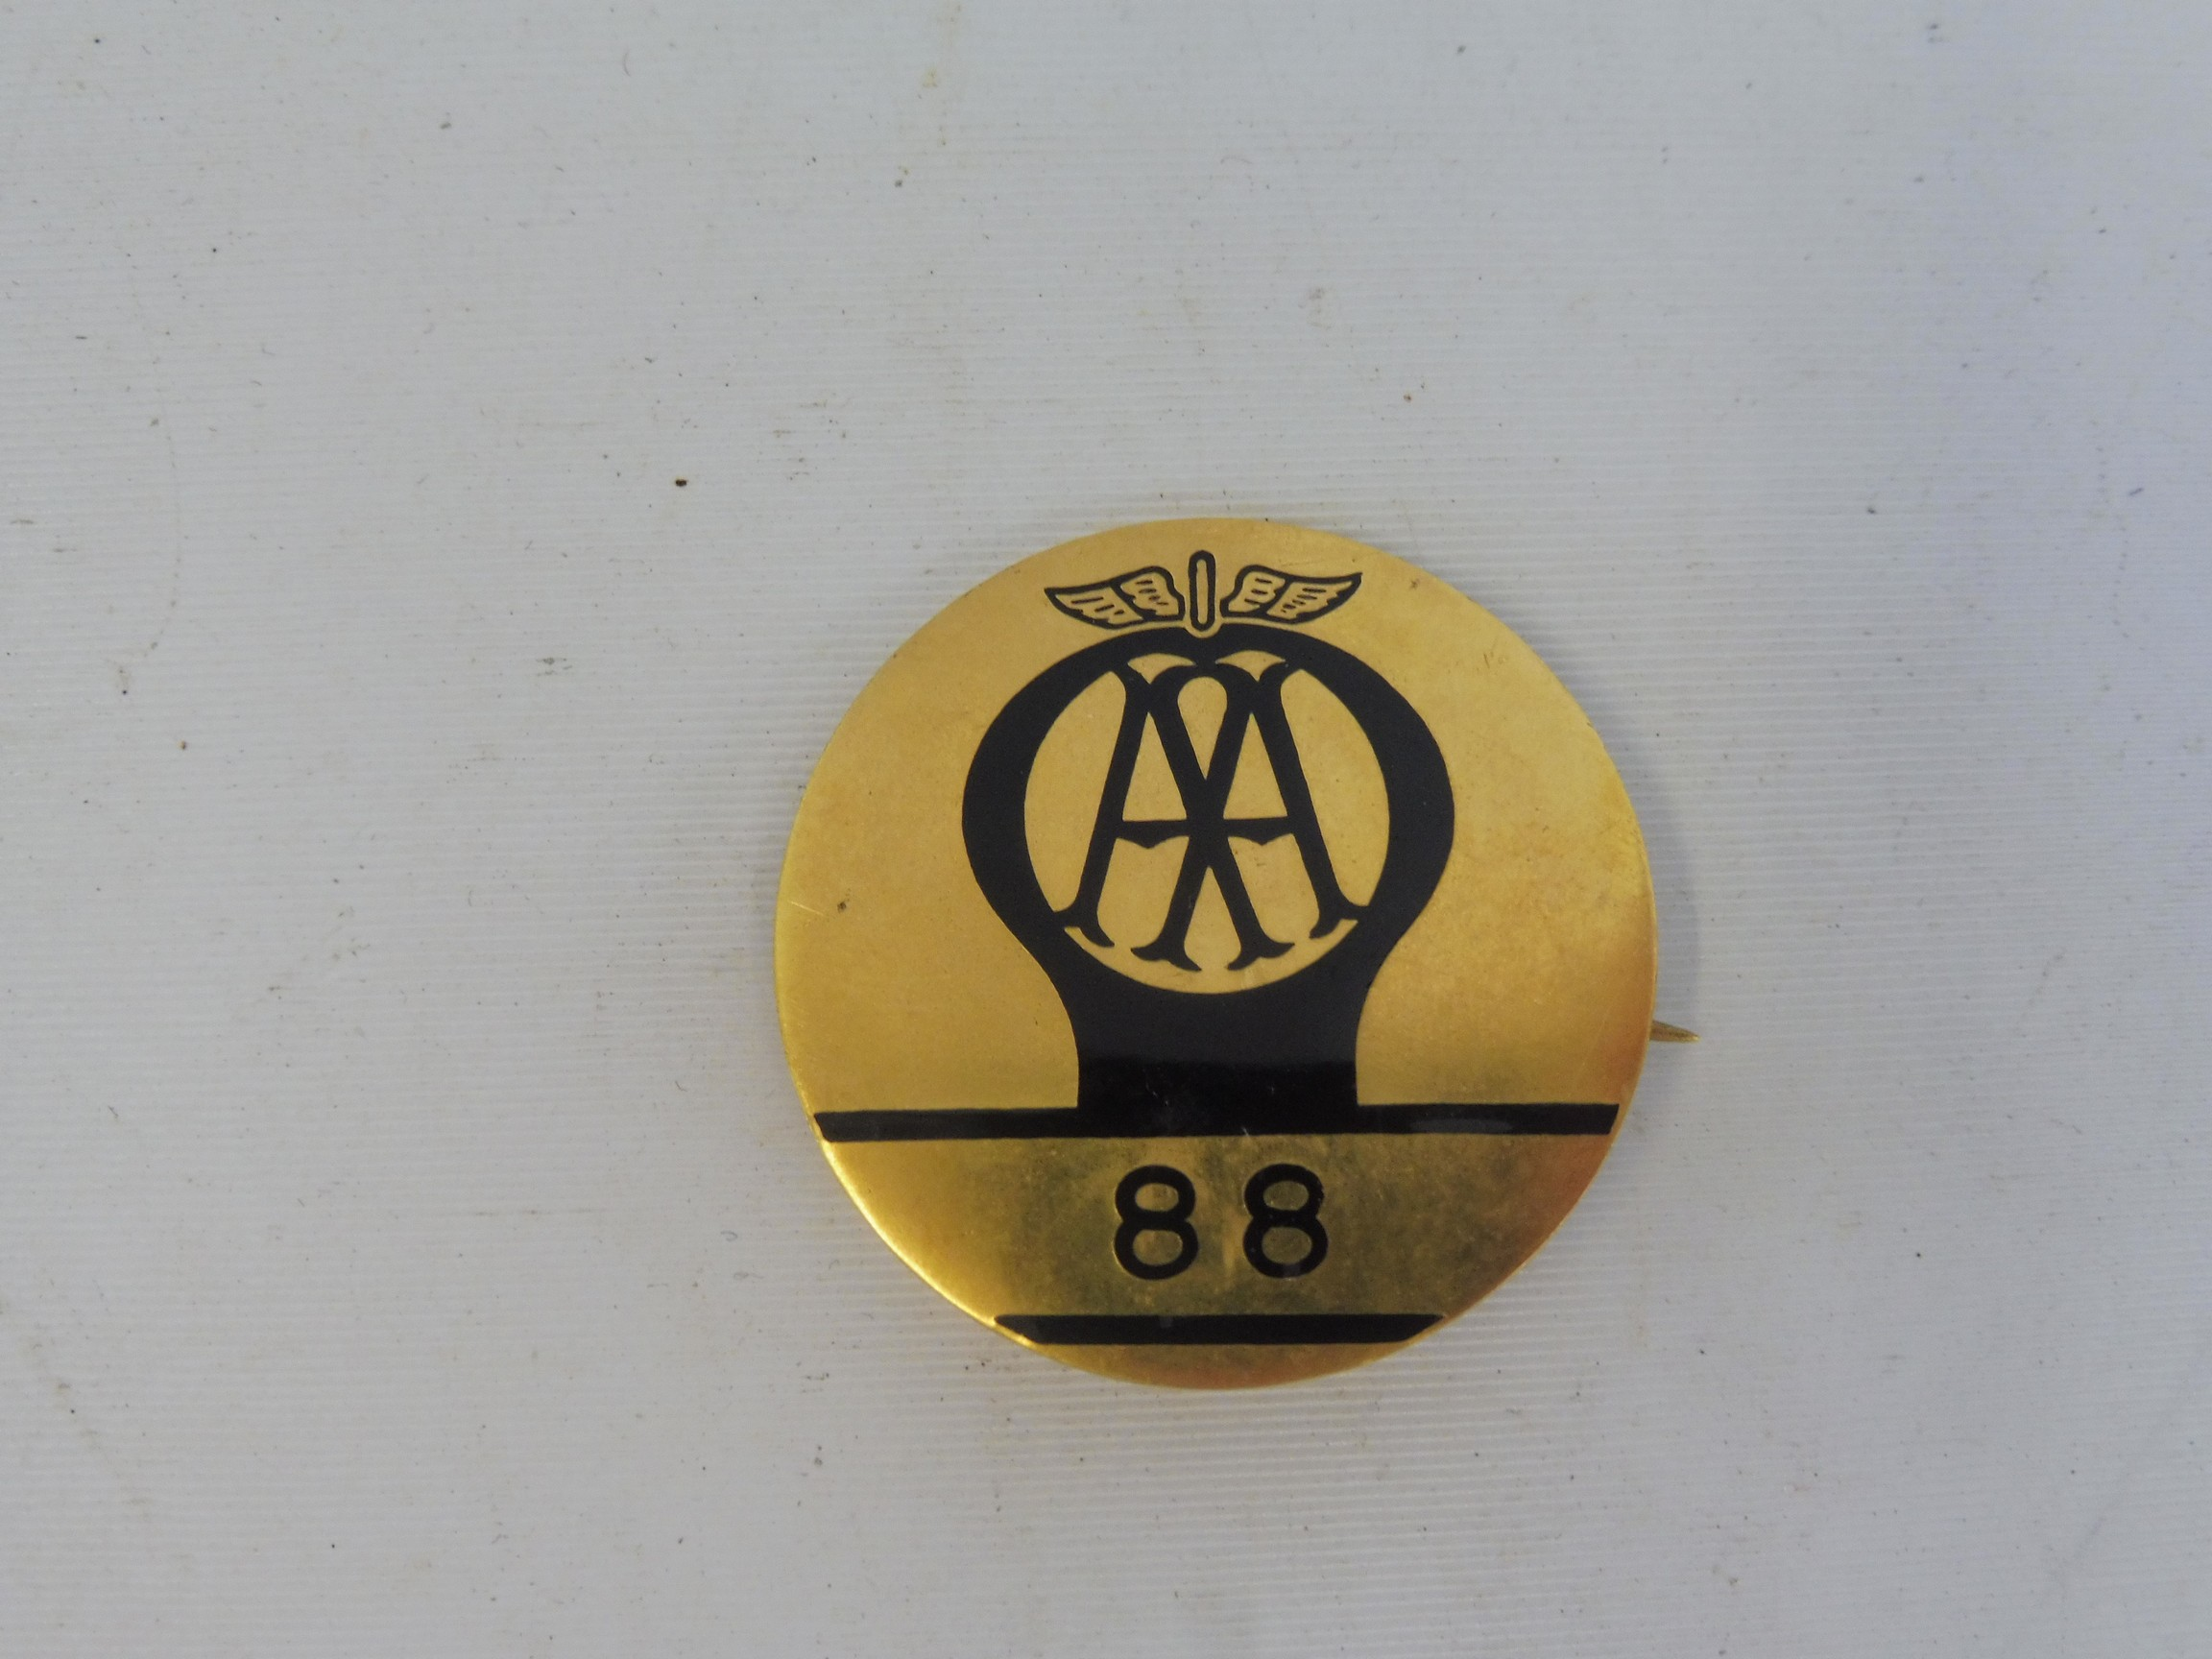 An AA patrolman's lapel badge for box 88.